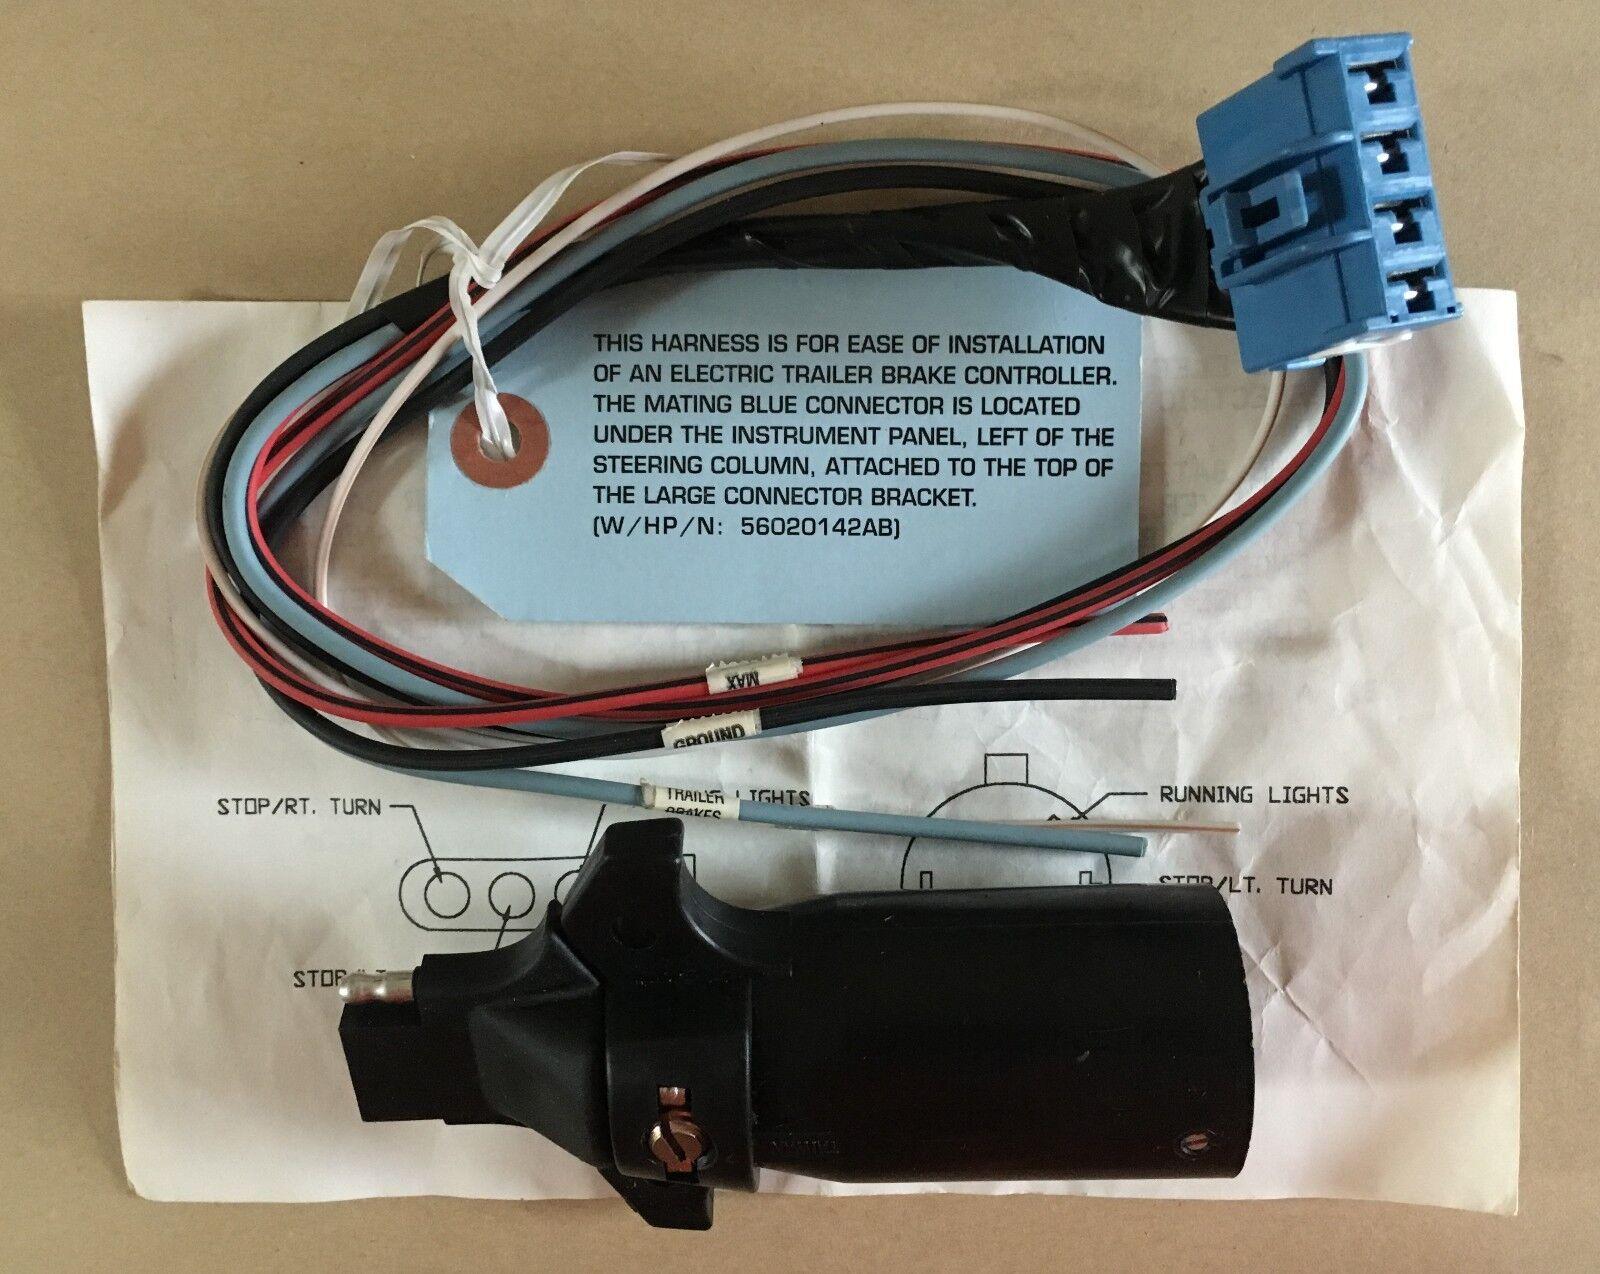 Dodge RAM Mopar 56020142AB Electric Trailer Brake Connector Wire | eBay